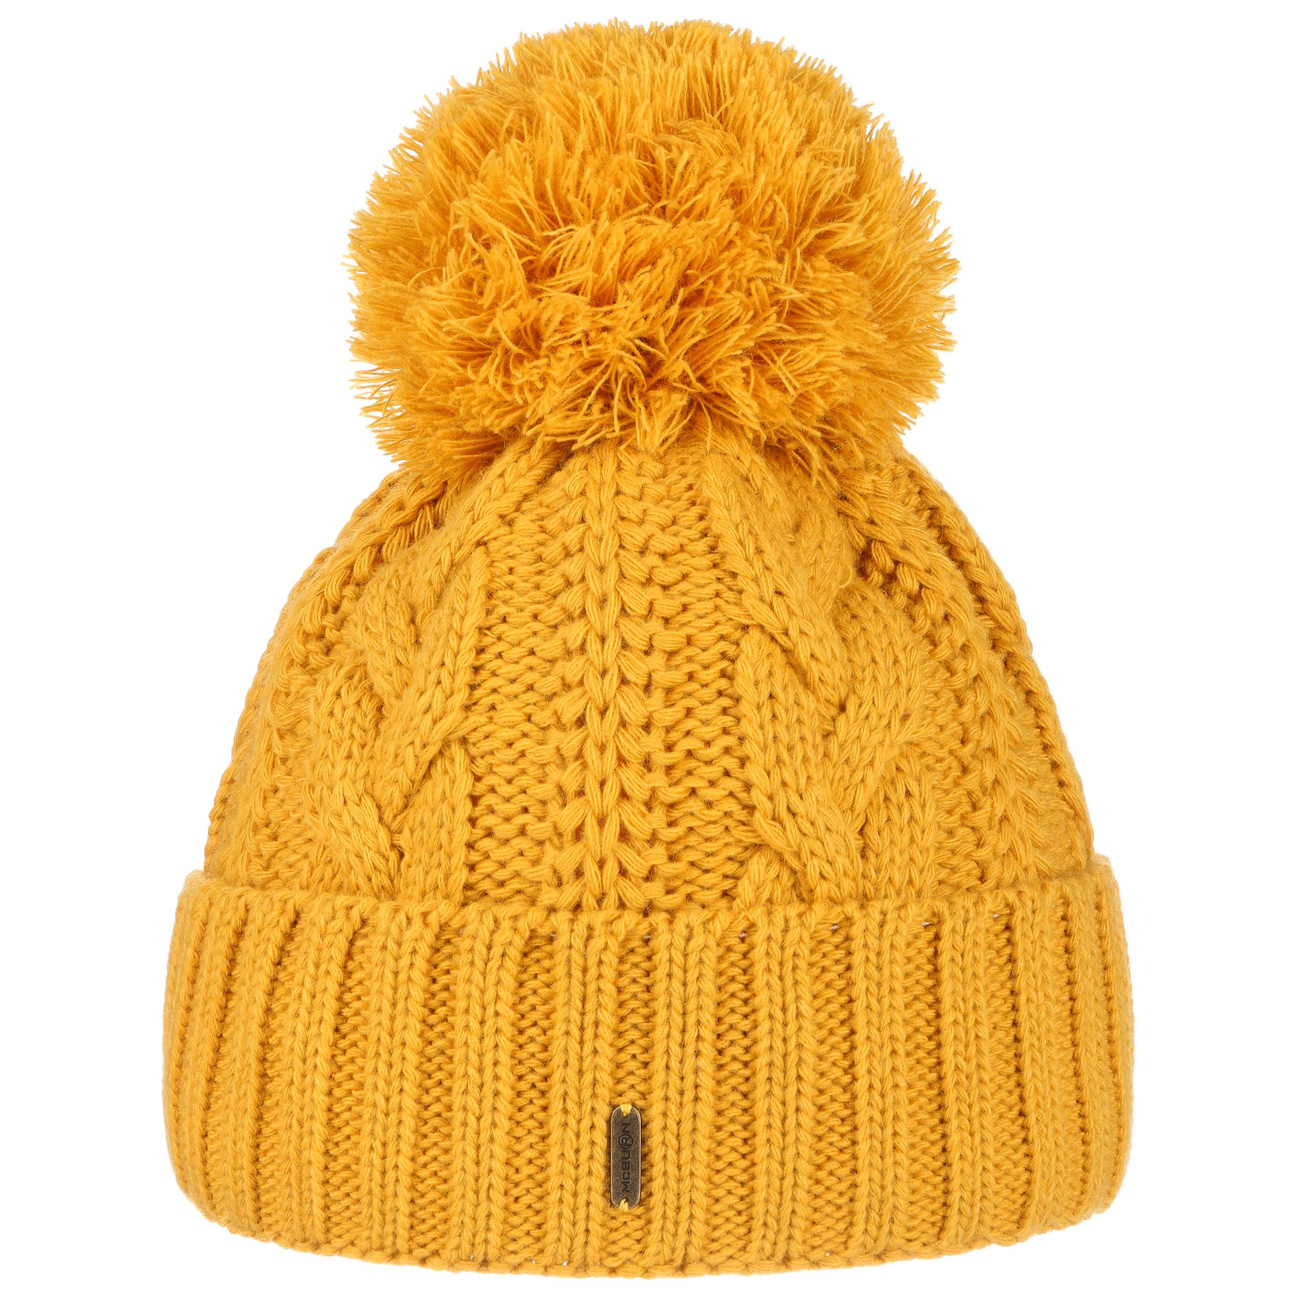 cbf43eb96ef ... Giant Bobble Hat by McBURN - yellow 1 ...